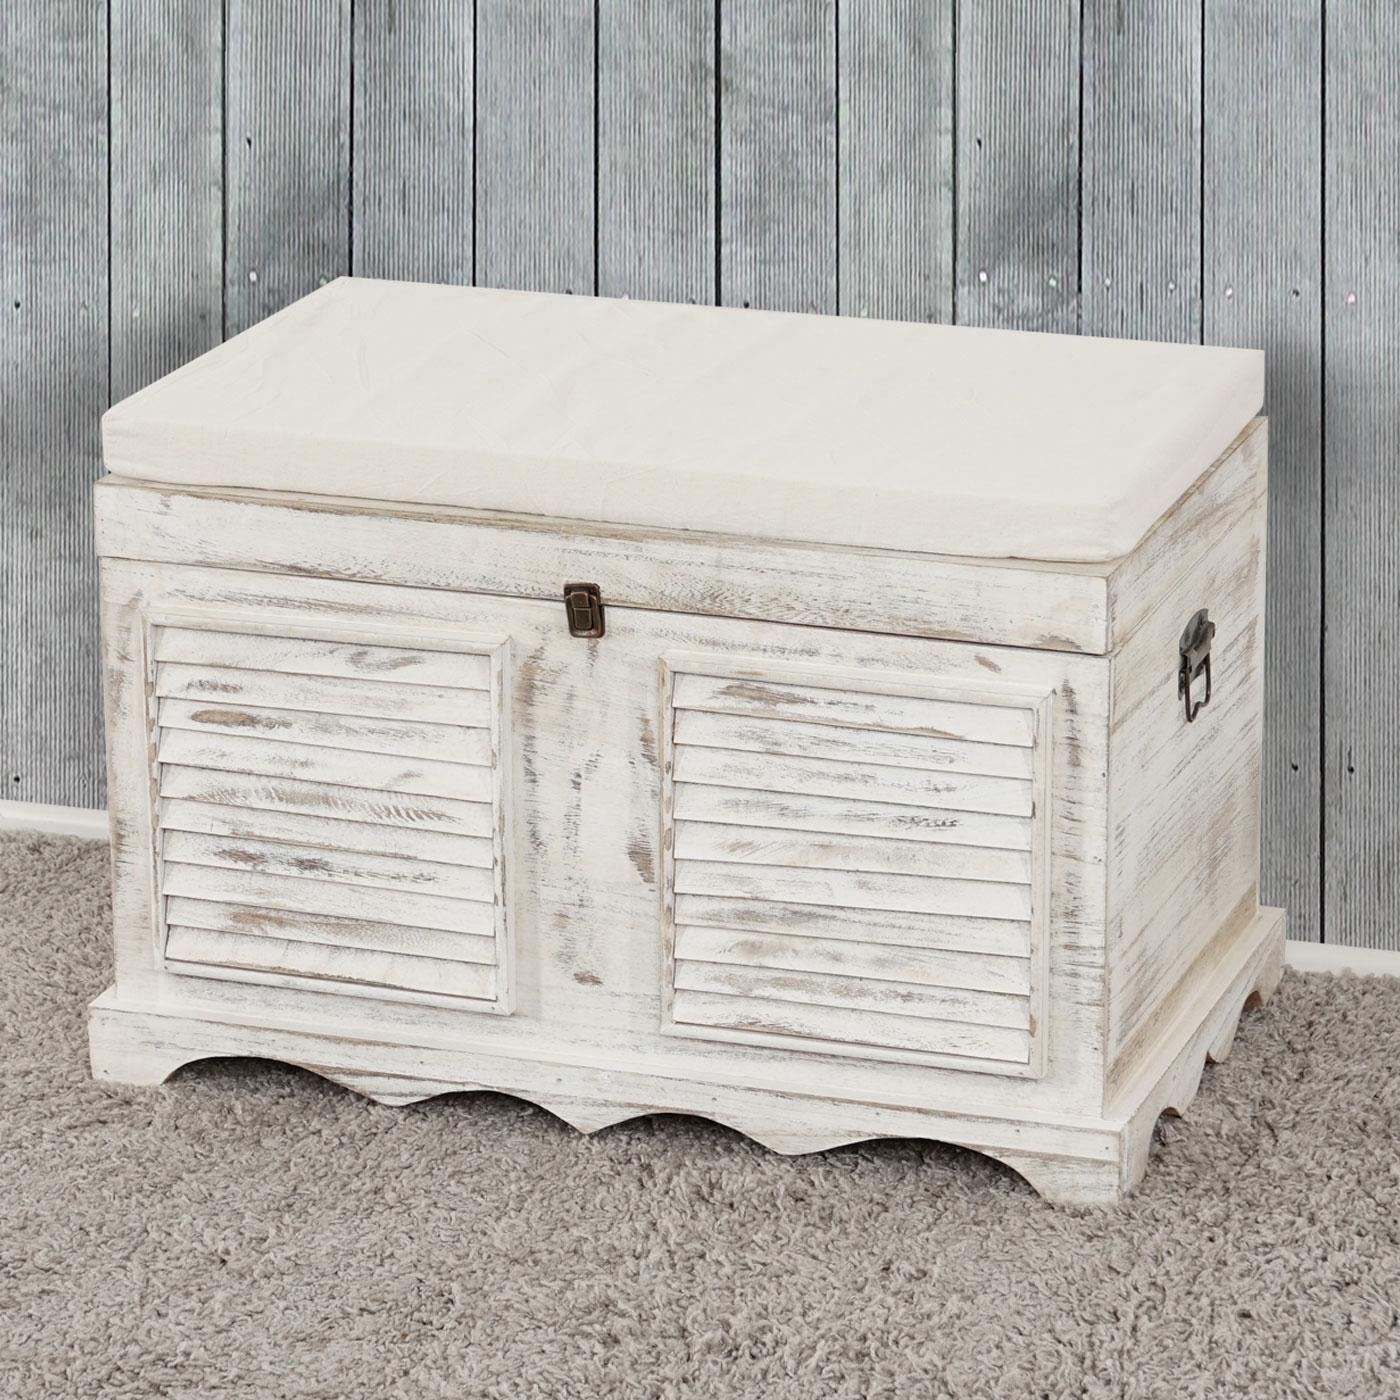 holztruhe t356 sitzbank aufbewahrungstruhe shabby look vintage 50x76x45cm wei. Black Bedroom Furniture Sets. Home Design Ideas